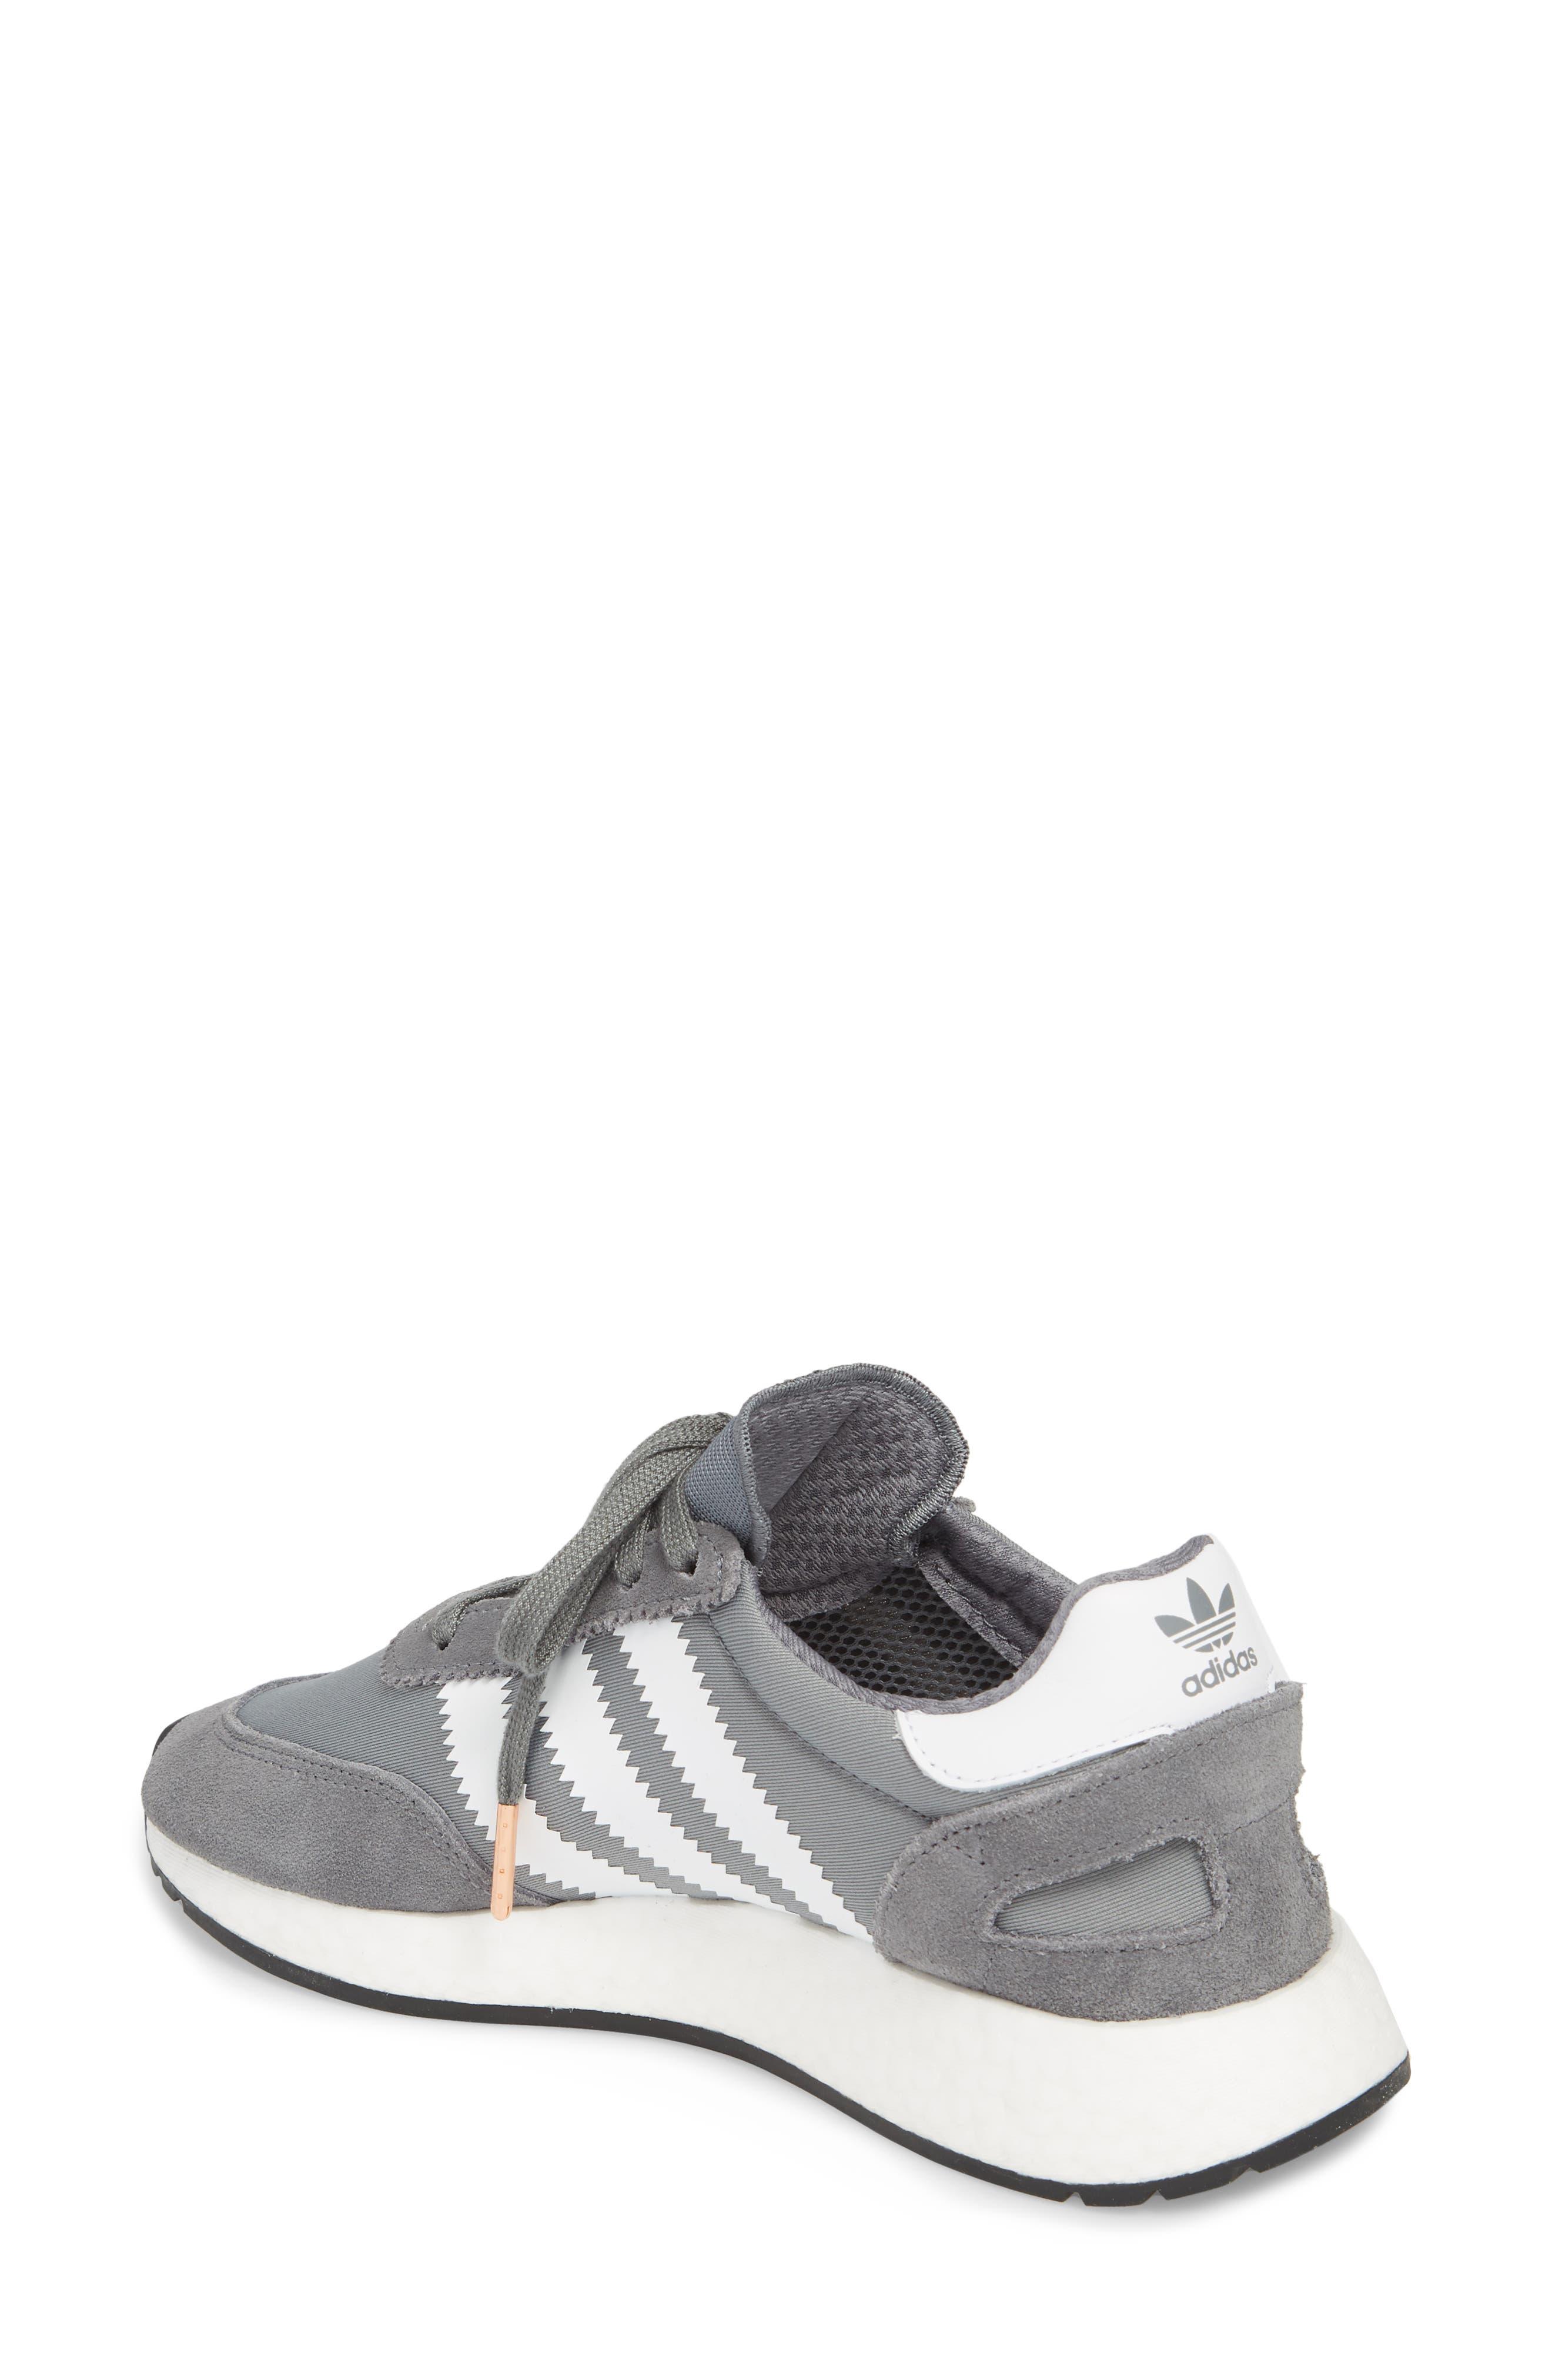 I-5923 Sneaker,                             Alternate thumbnail 2, color,                             Visible Grey/ White/ Black